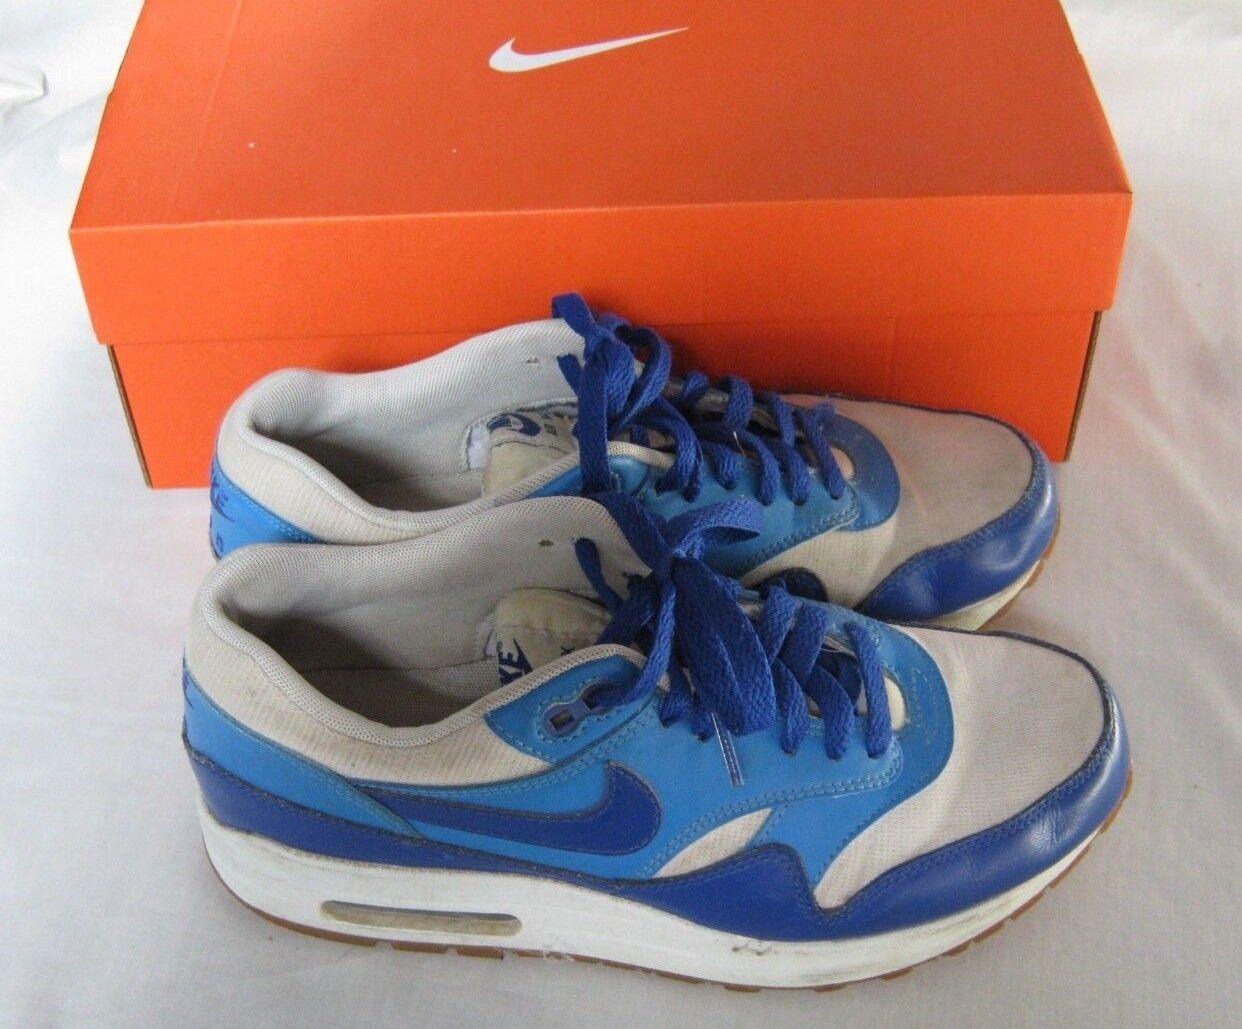 Nike Air Max 1 Vntg Vintage para para para Mujer Entrenadores Azul 855284 105-UK 5.5 EU 39 nos 8  100% a estrenar con calidad original.